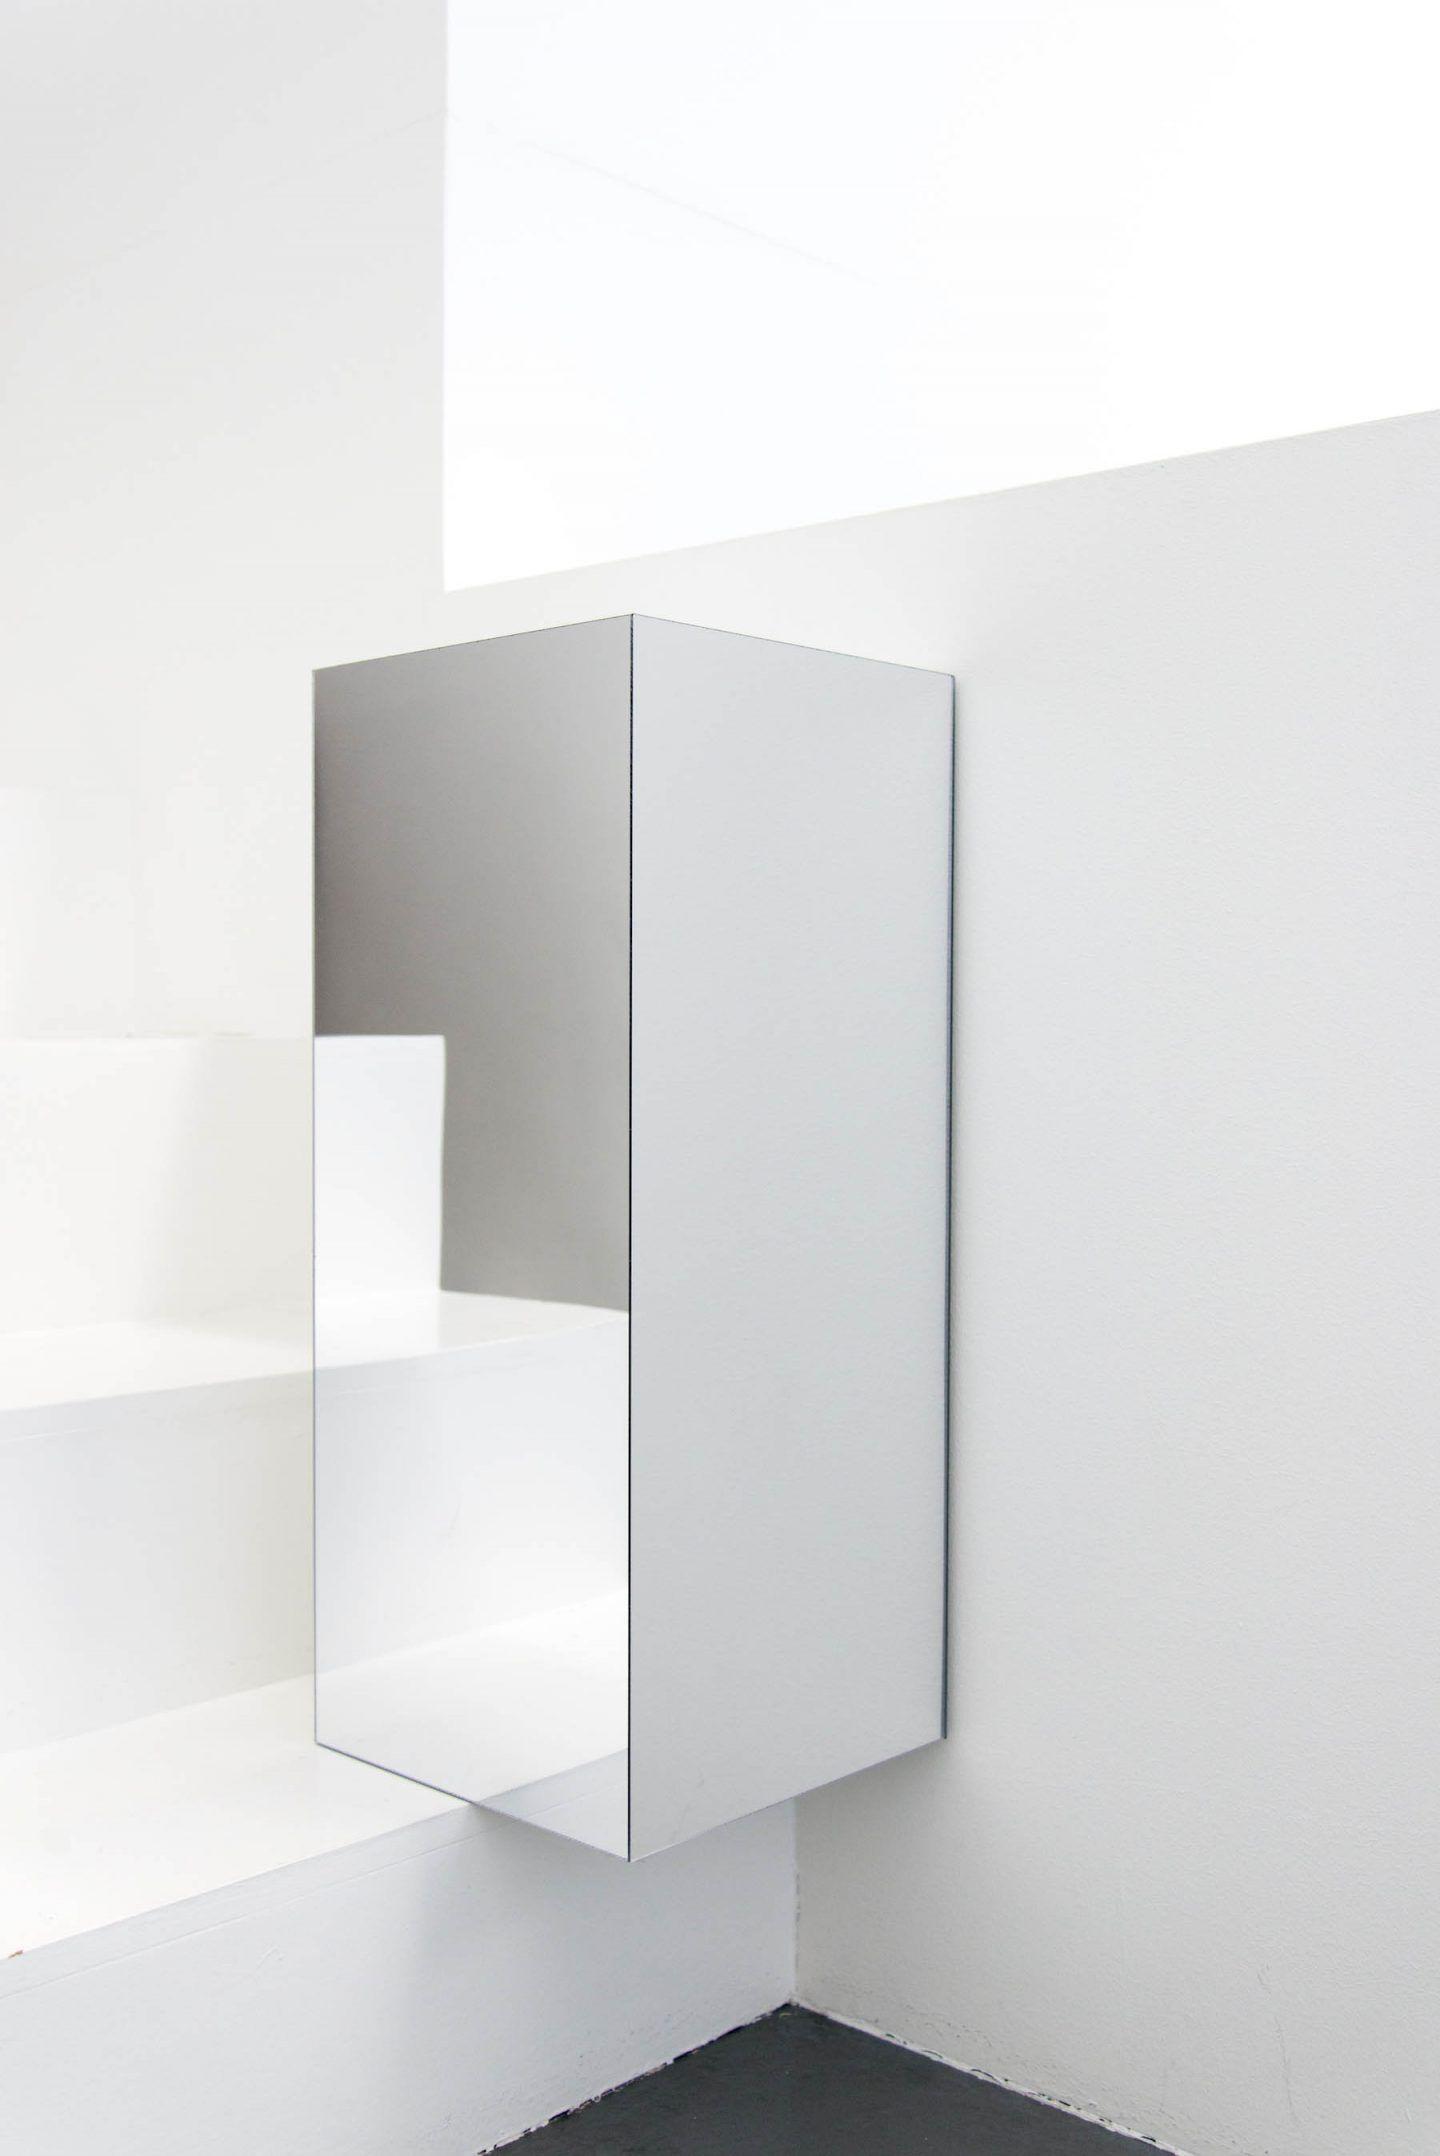 IGNANT-Art-Sali-Muller-Fragile-Gebilde-06